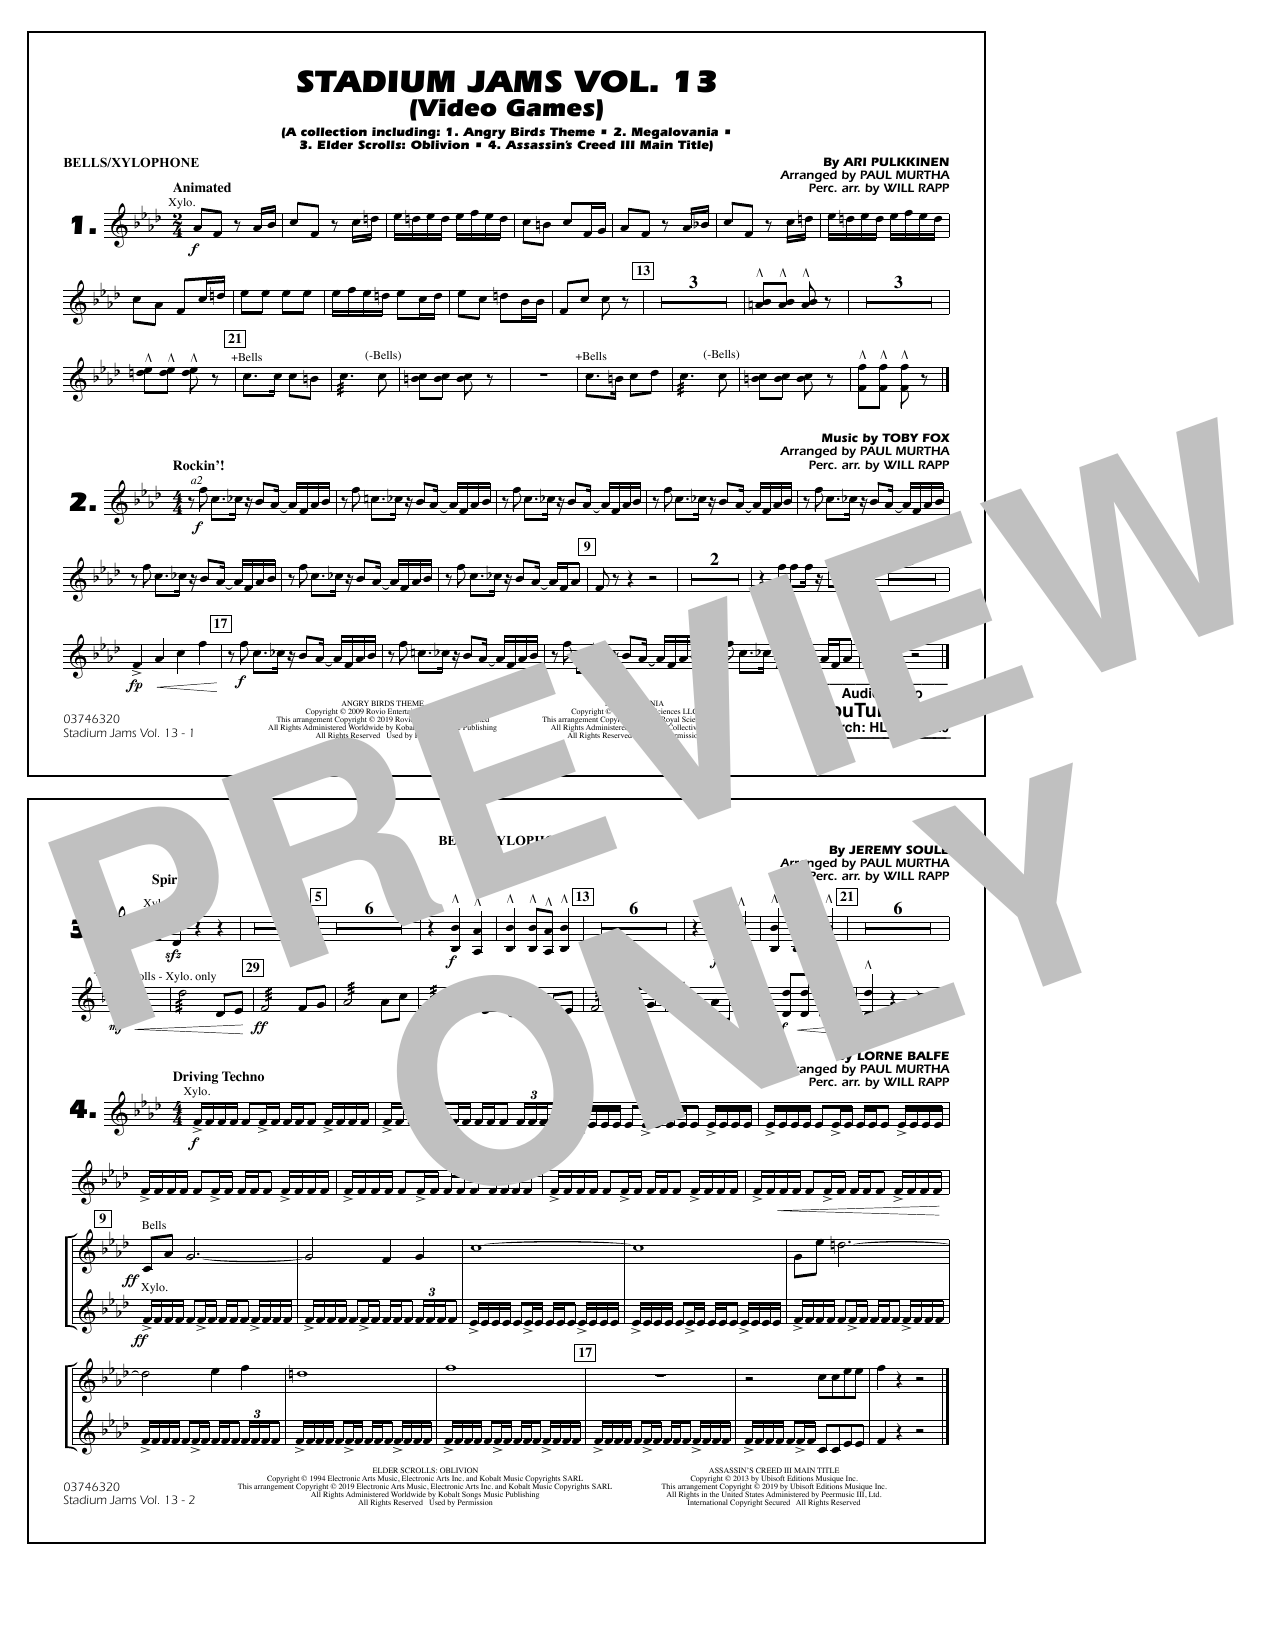 Stadium Jams Volume 13 (Video Games) - Bells/Xylophone (Marching Band)